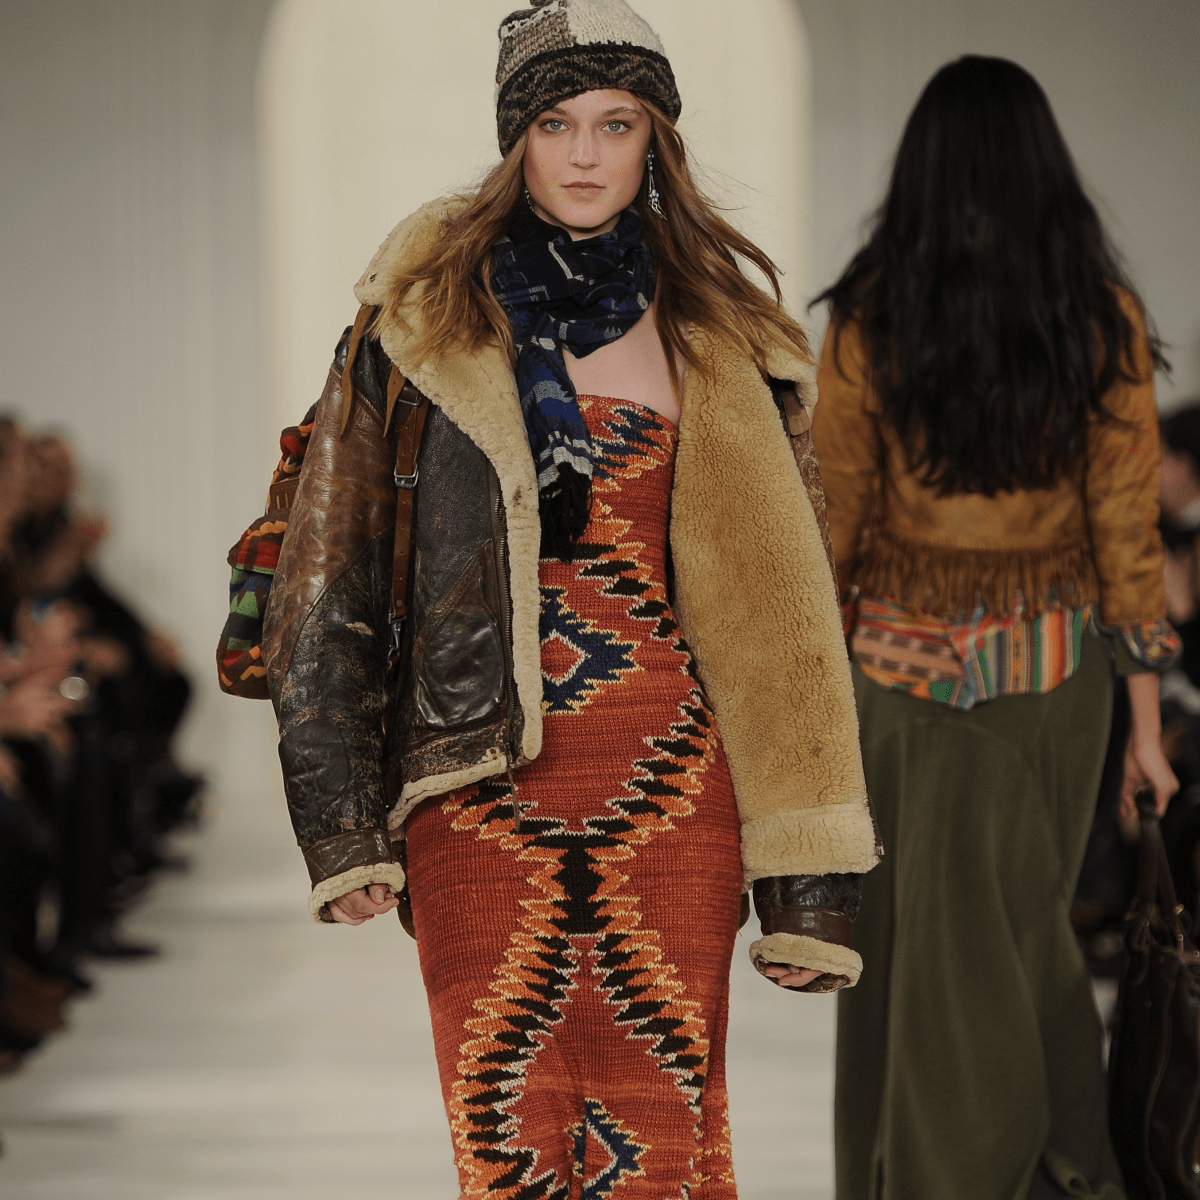 Ralph Lauren Polo fall fashion February 2014